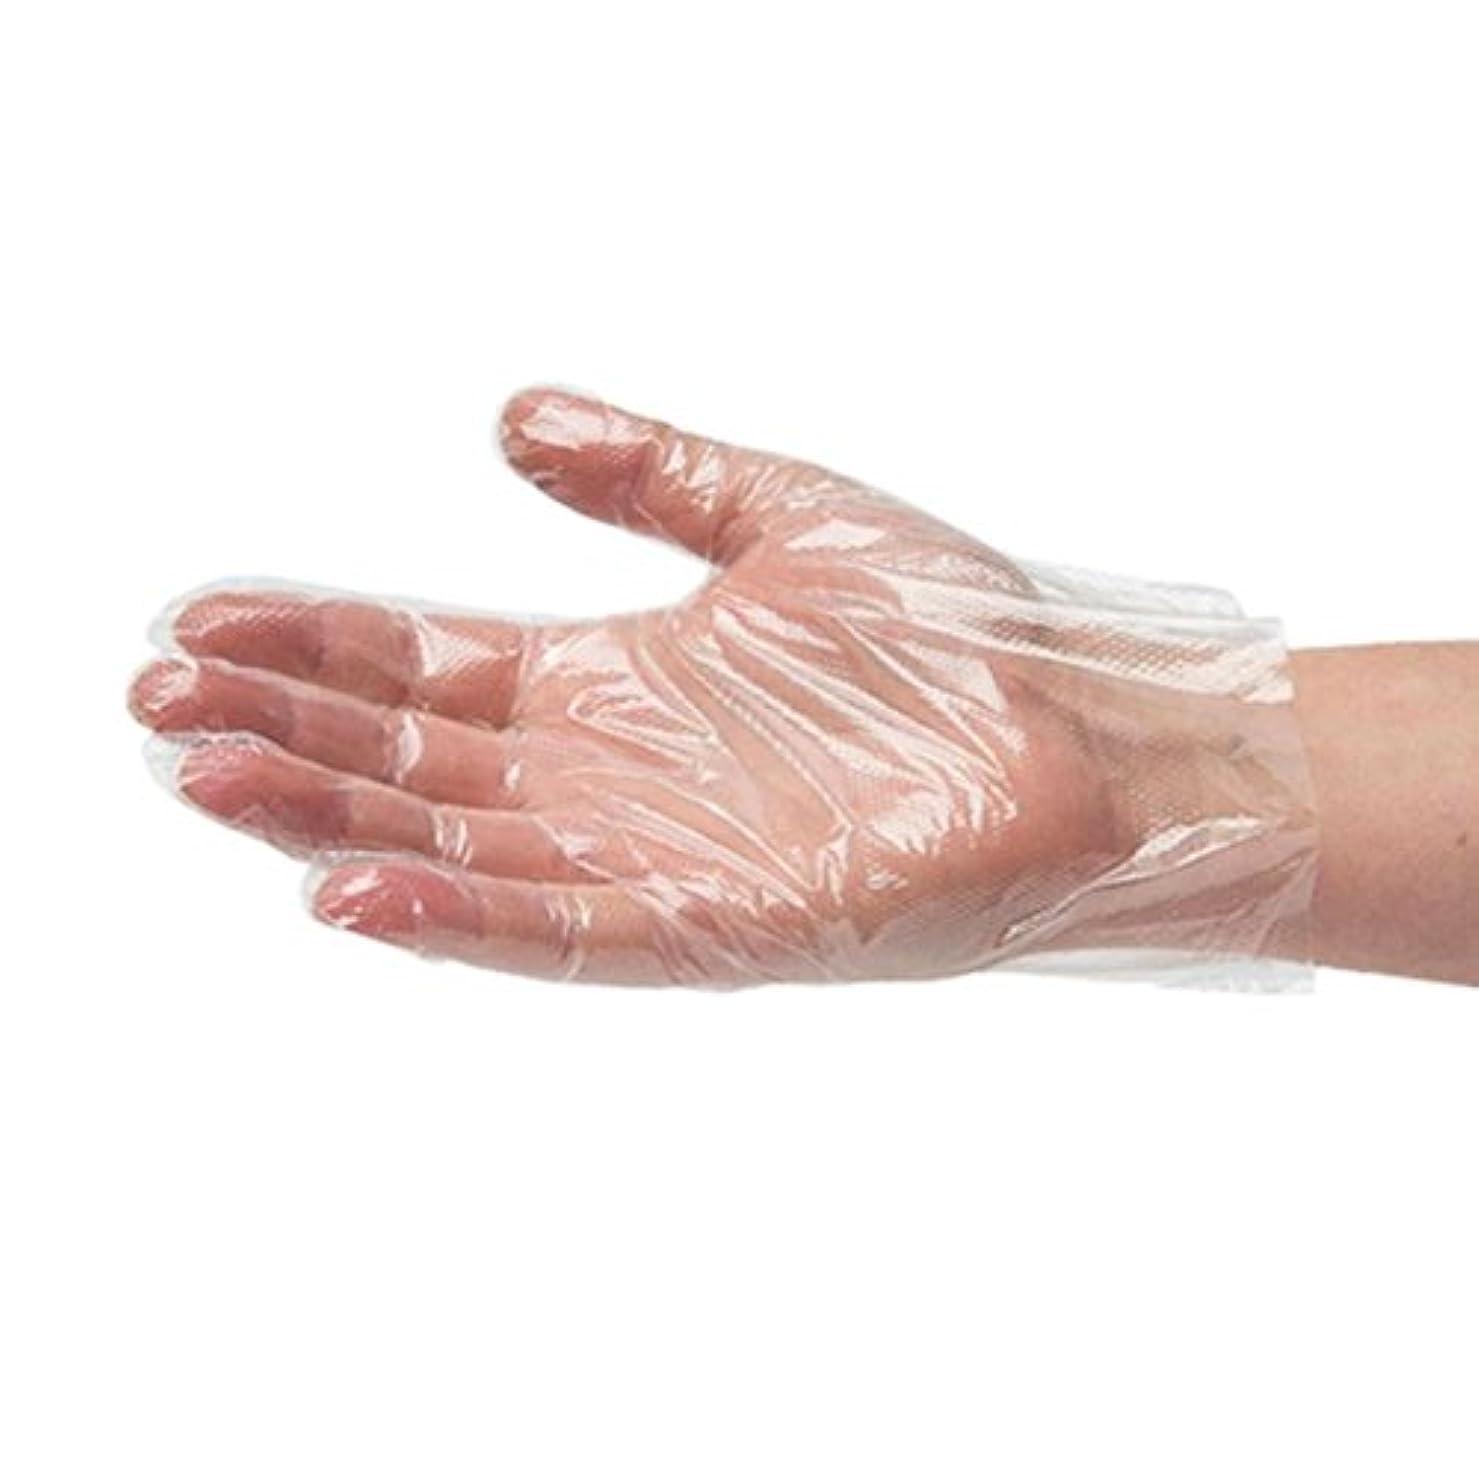 KINGZUO 使い捨て 調理 ビニール極薄手袋 200枚入 使いきり手袋 (500枚)